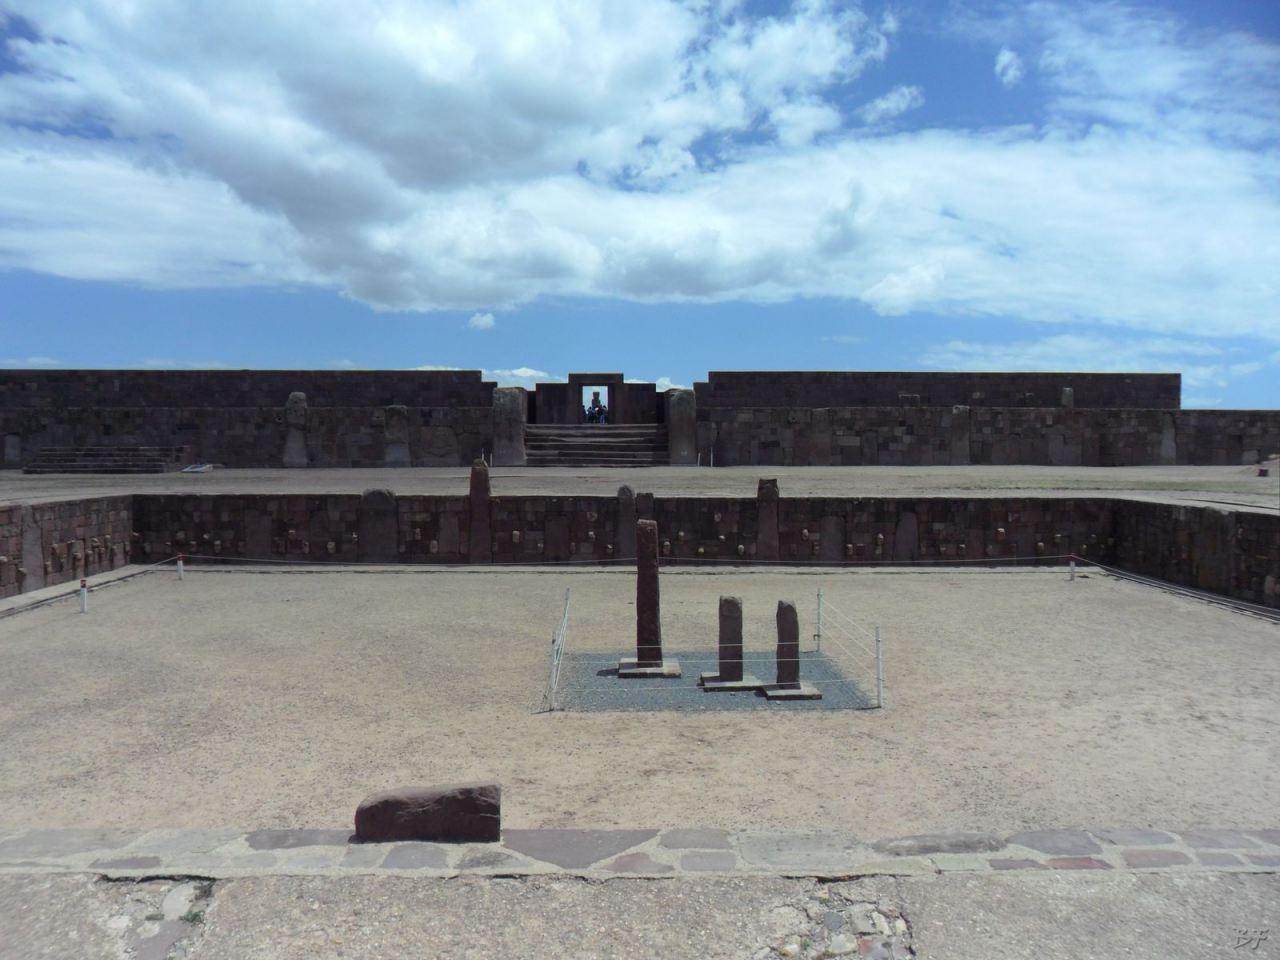 Sito-Megalitico-Piramide-Akapana-Kalasasaya-Menhir-Tiahuanaco-Bolivia-75